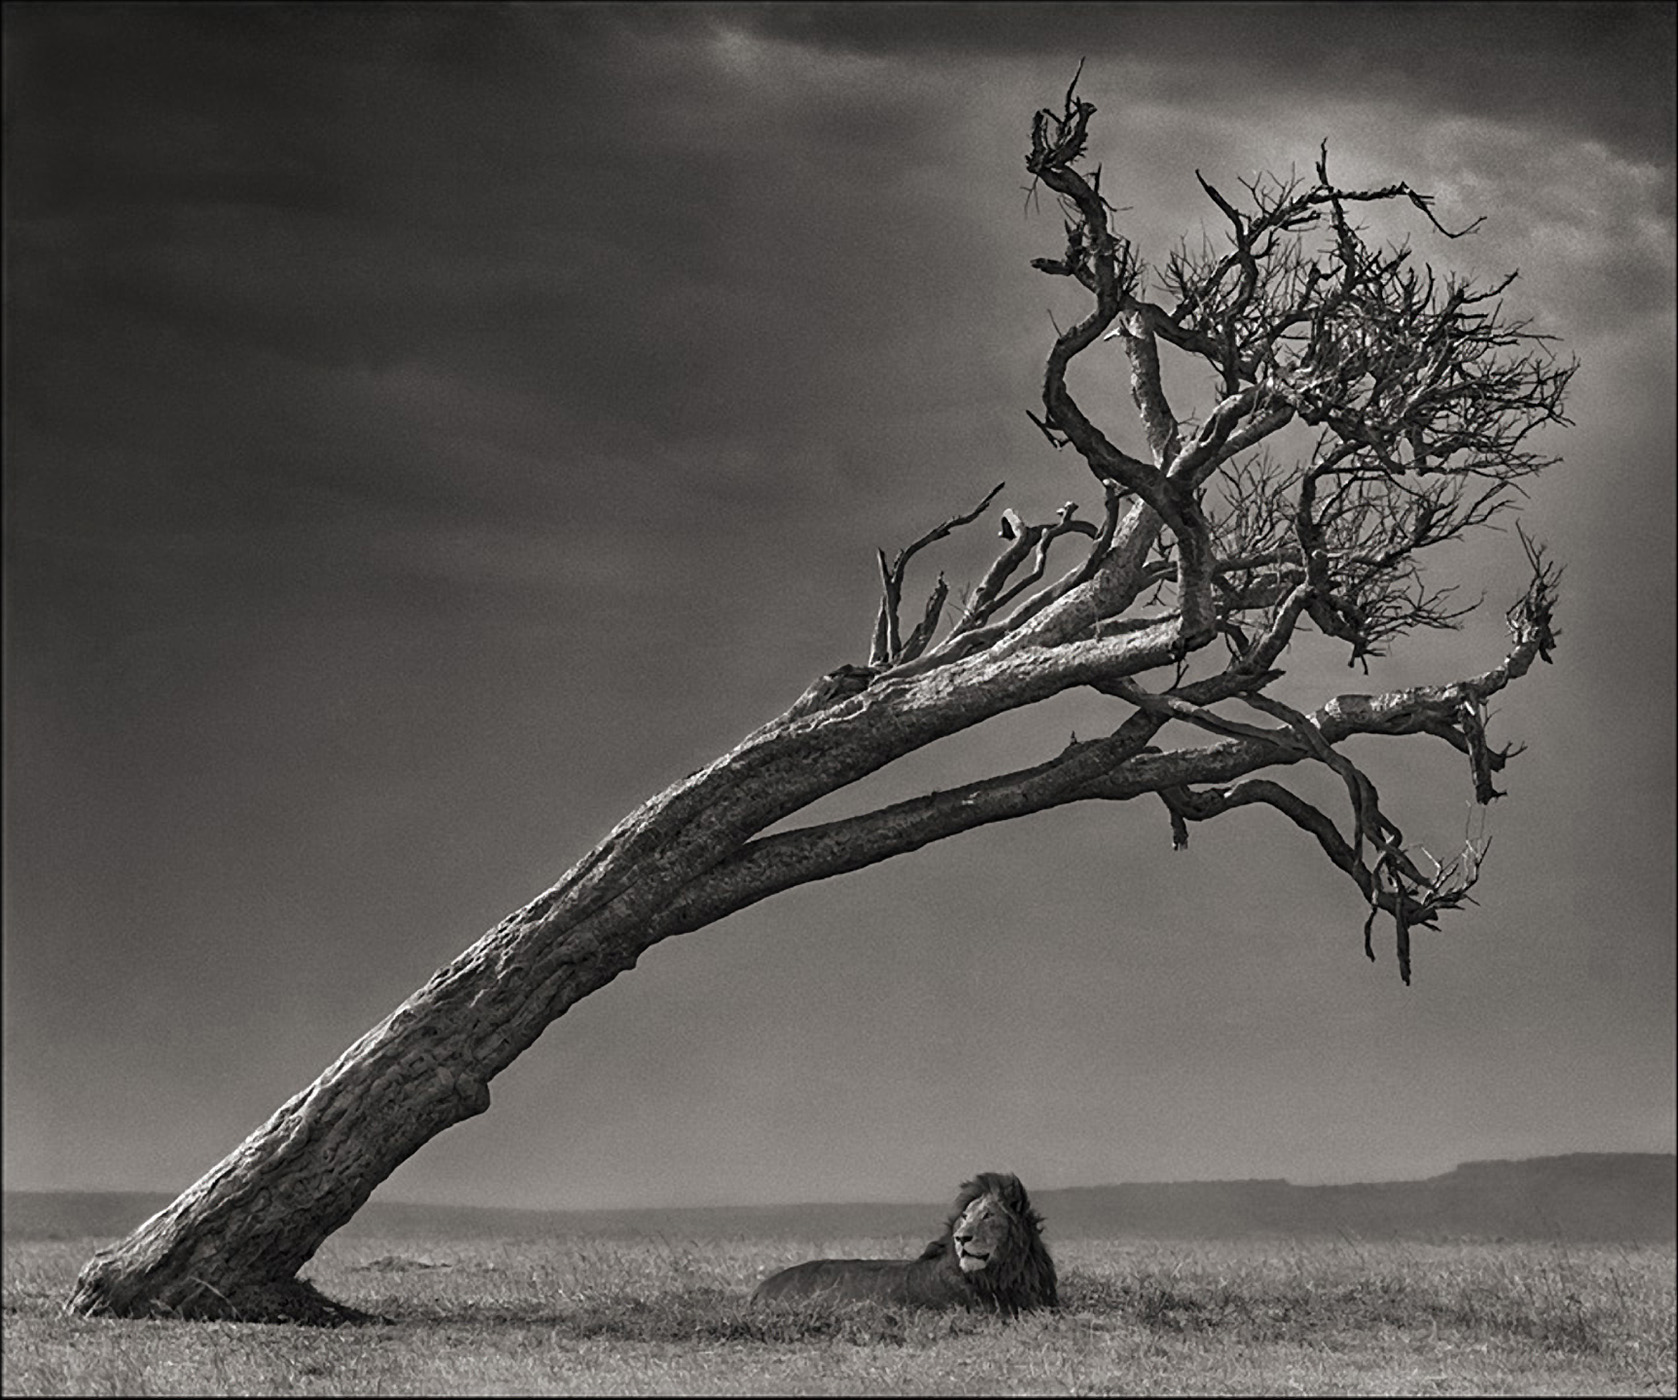 Lion Under Leaning Tree, Maasai Mara, 2008